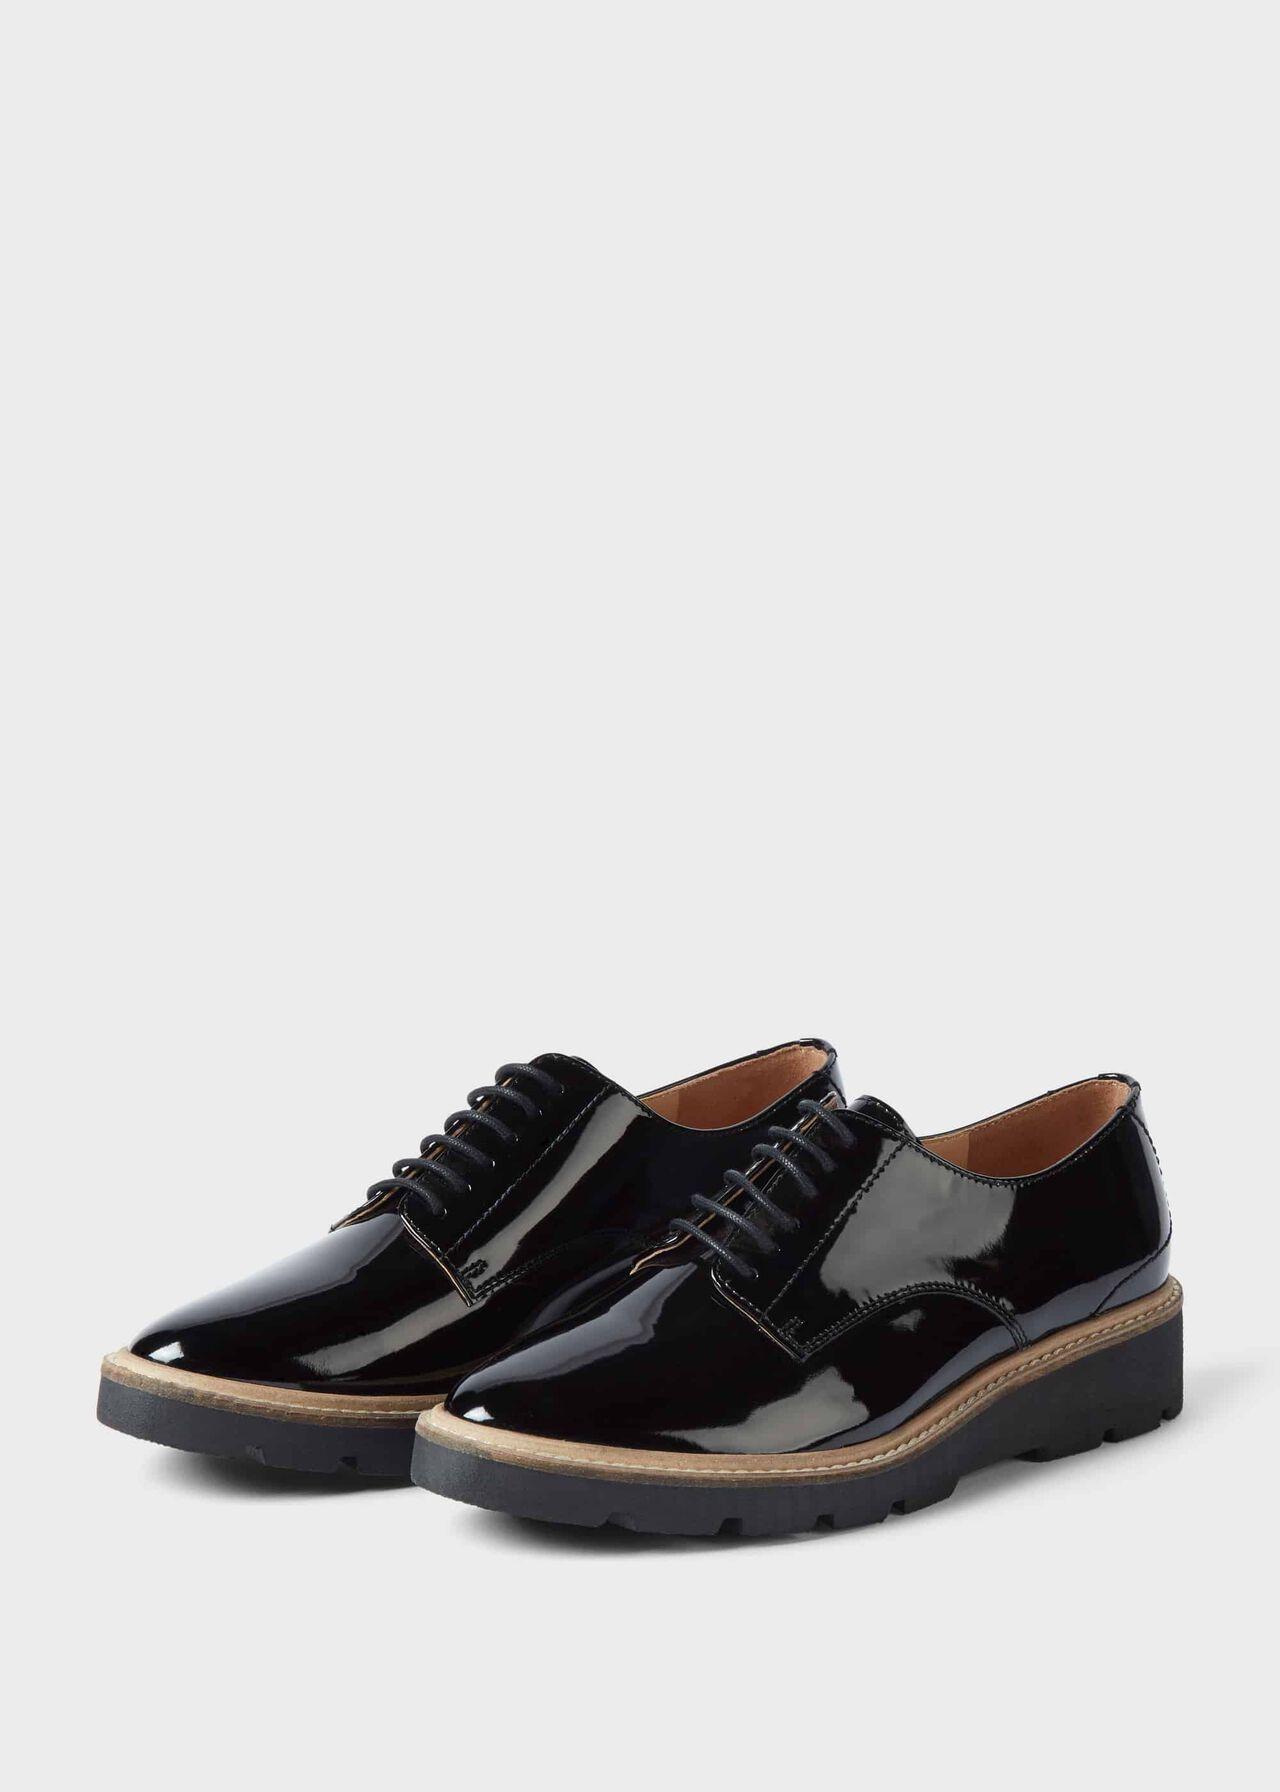 Bloomsbury Patent Flat Shoes Black